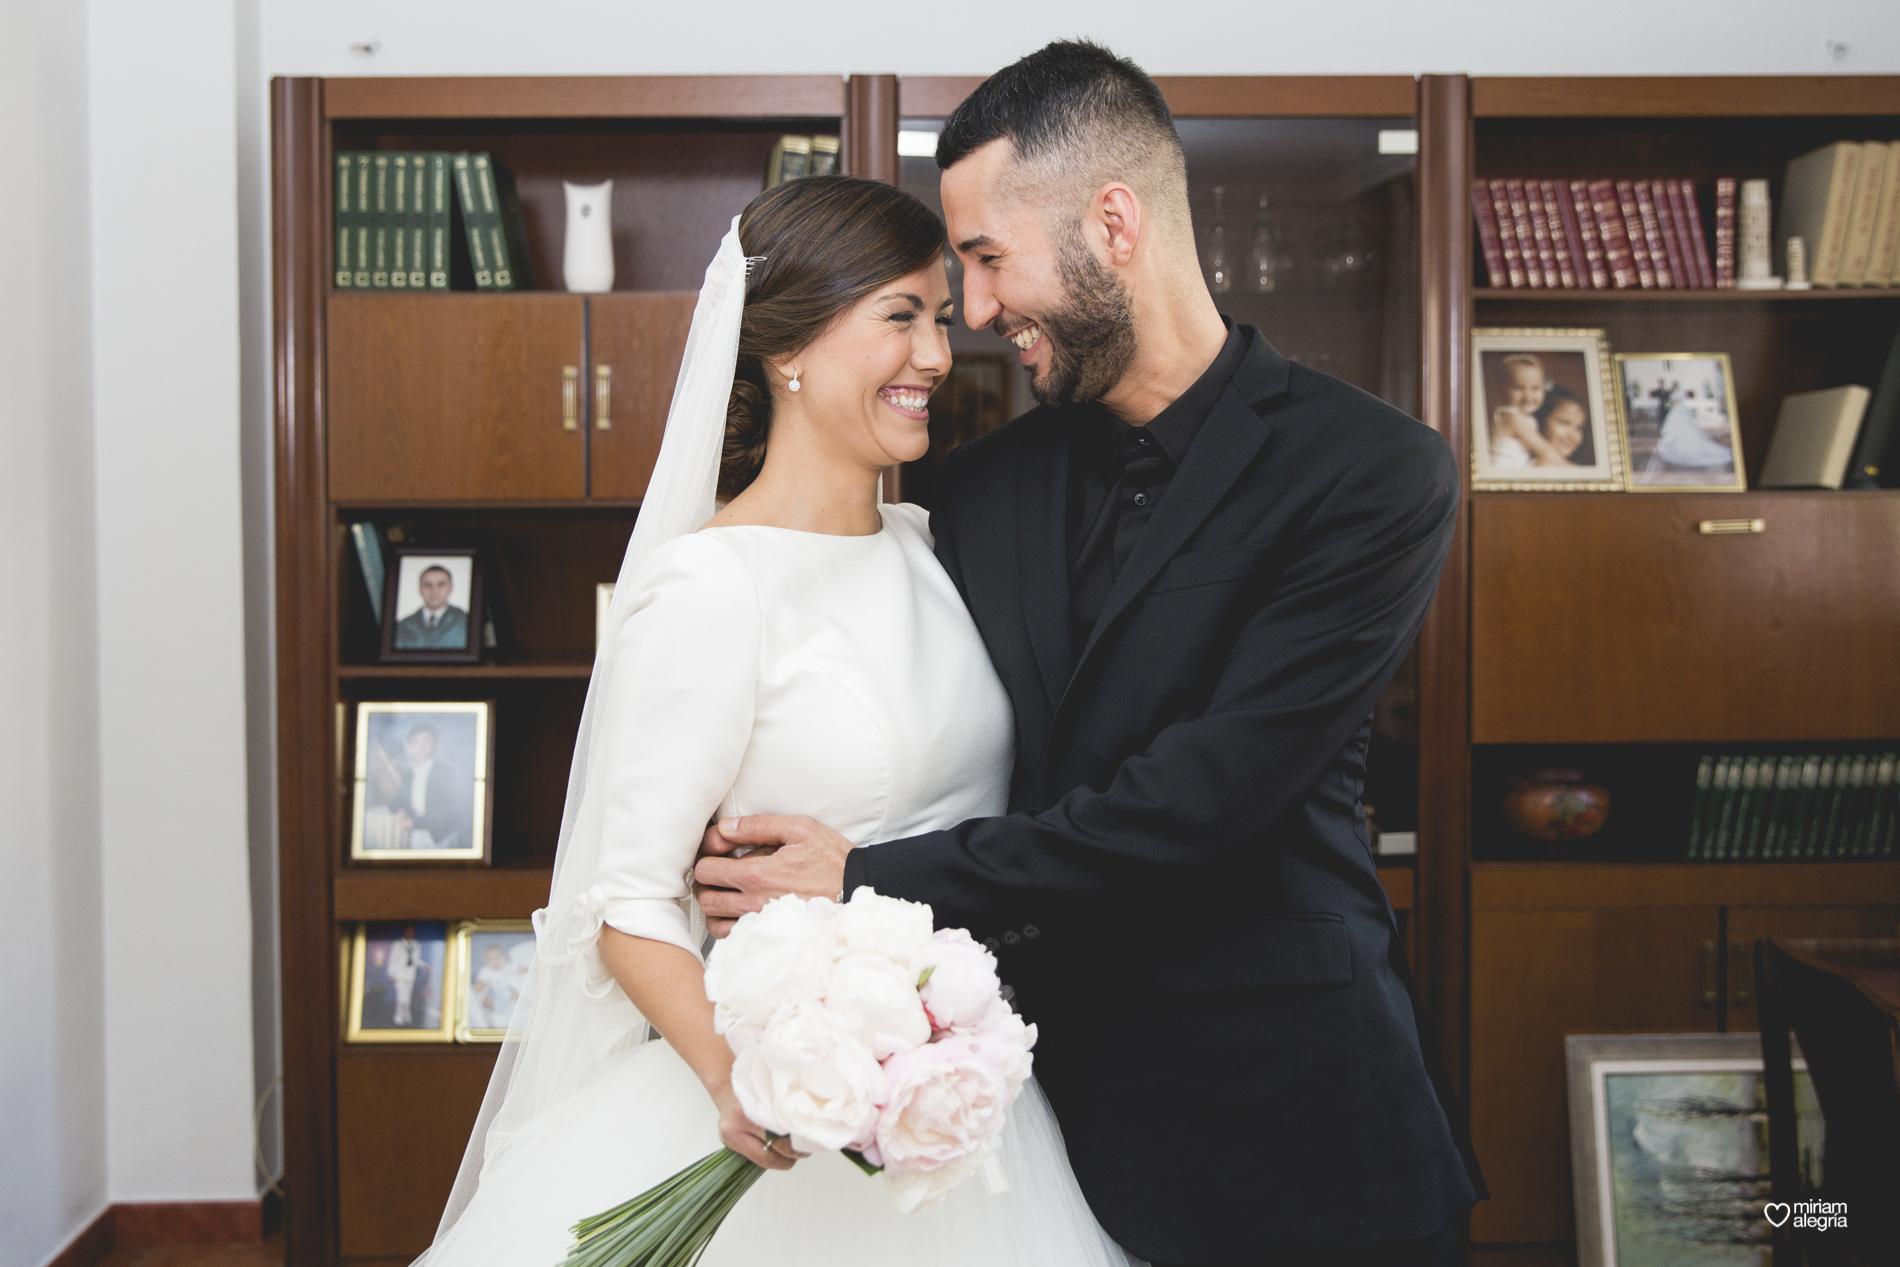 boda-en-la-catedral-de-murcia-miriam-alegria-fotografos-boda-murcia-31